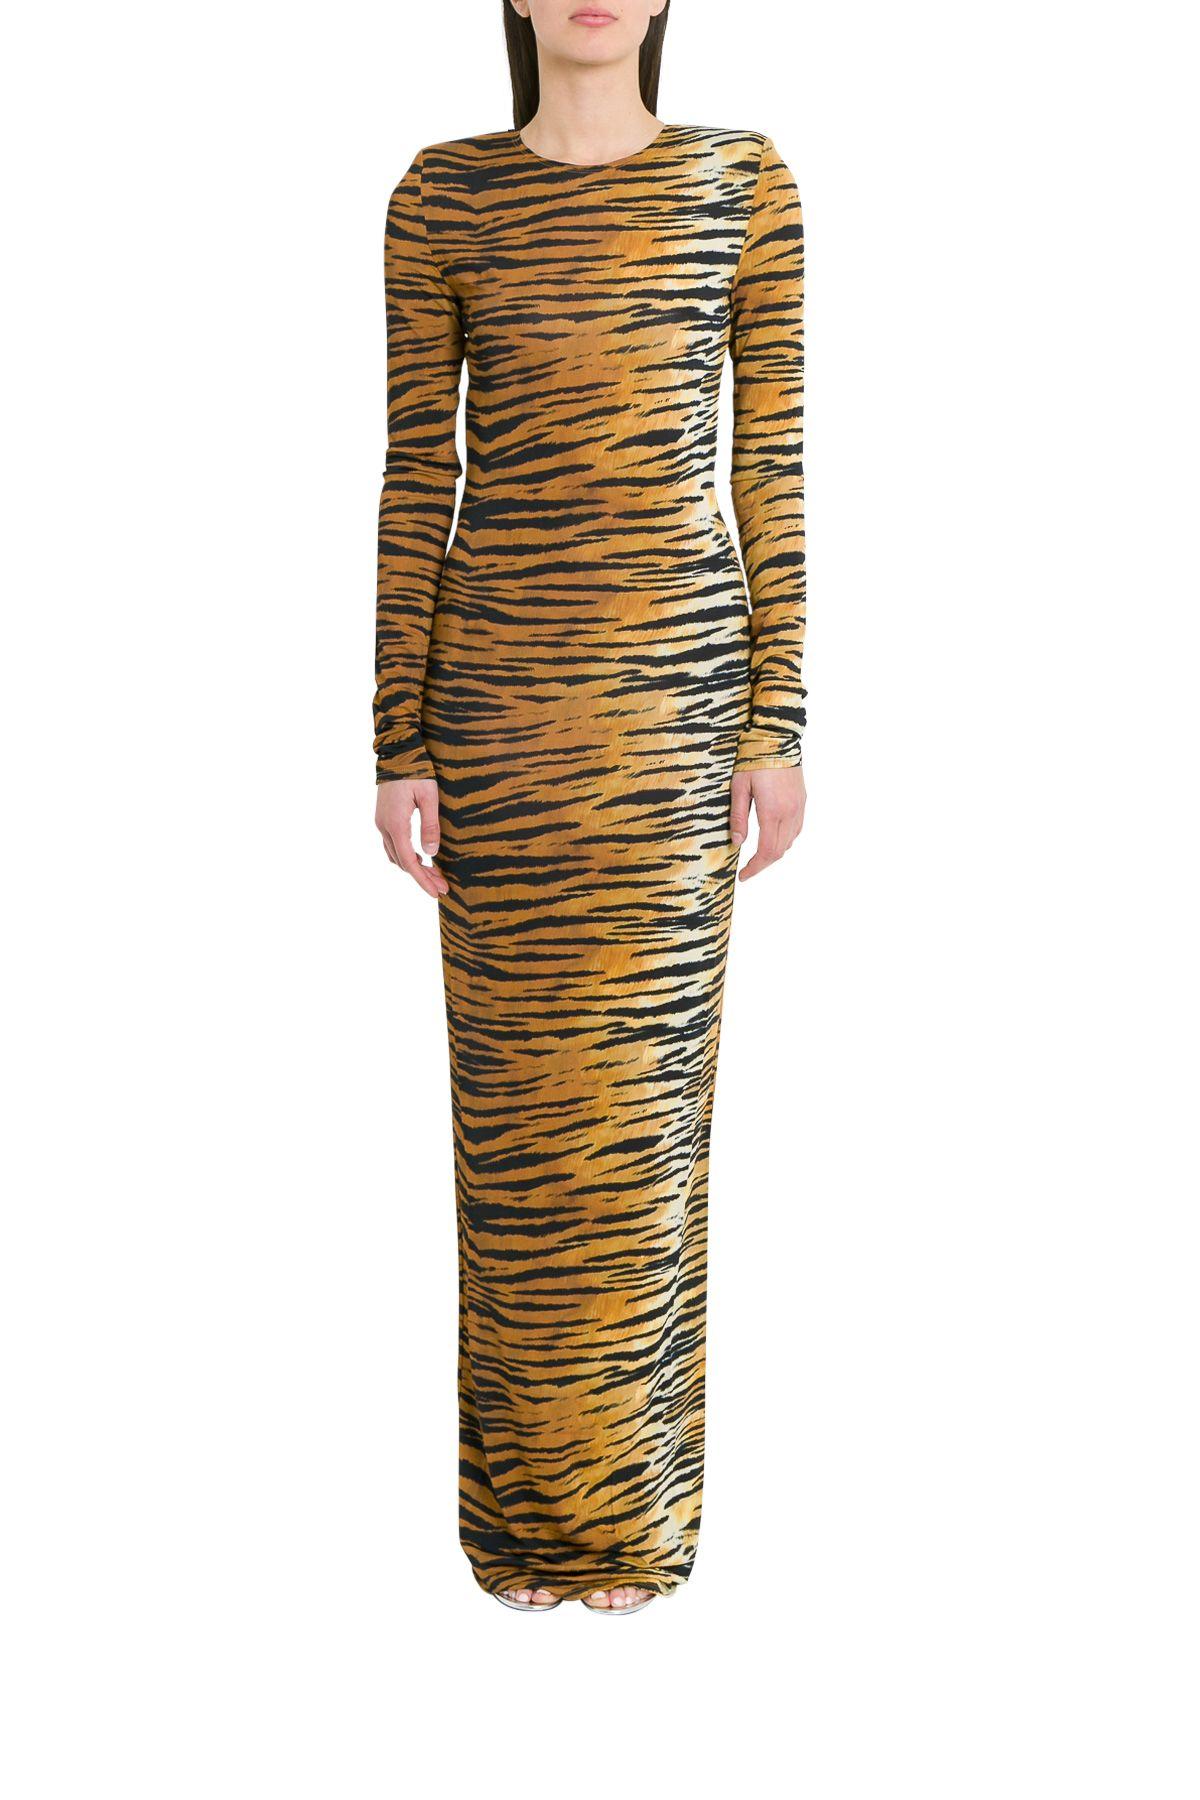 Alexandre Vauthier Dresses LON TIGER PRINTED DRESS